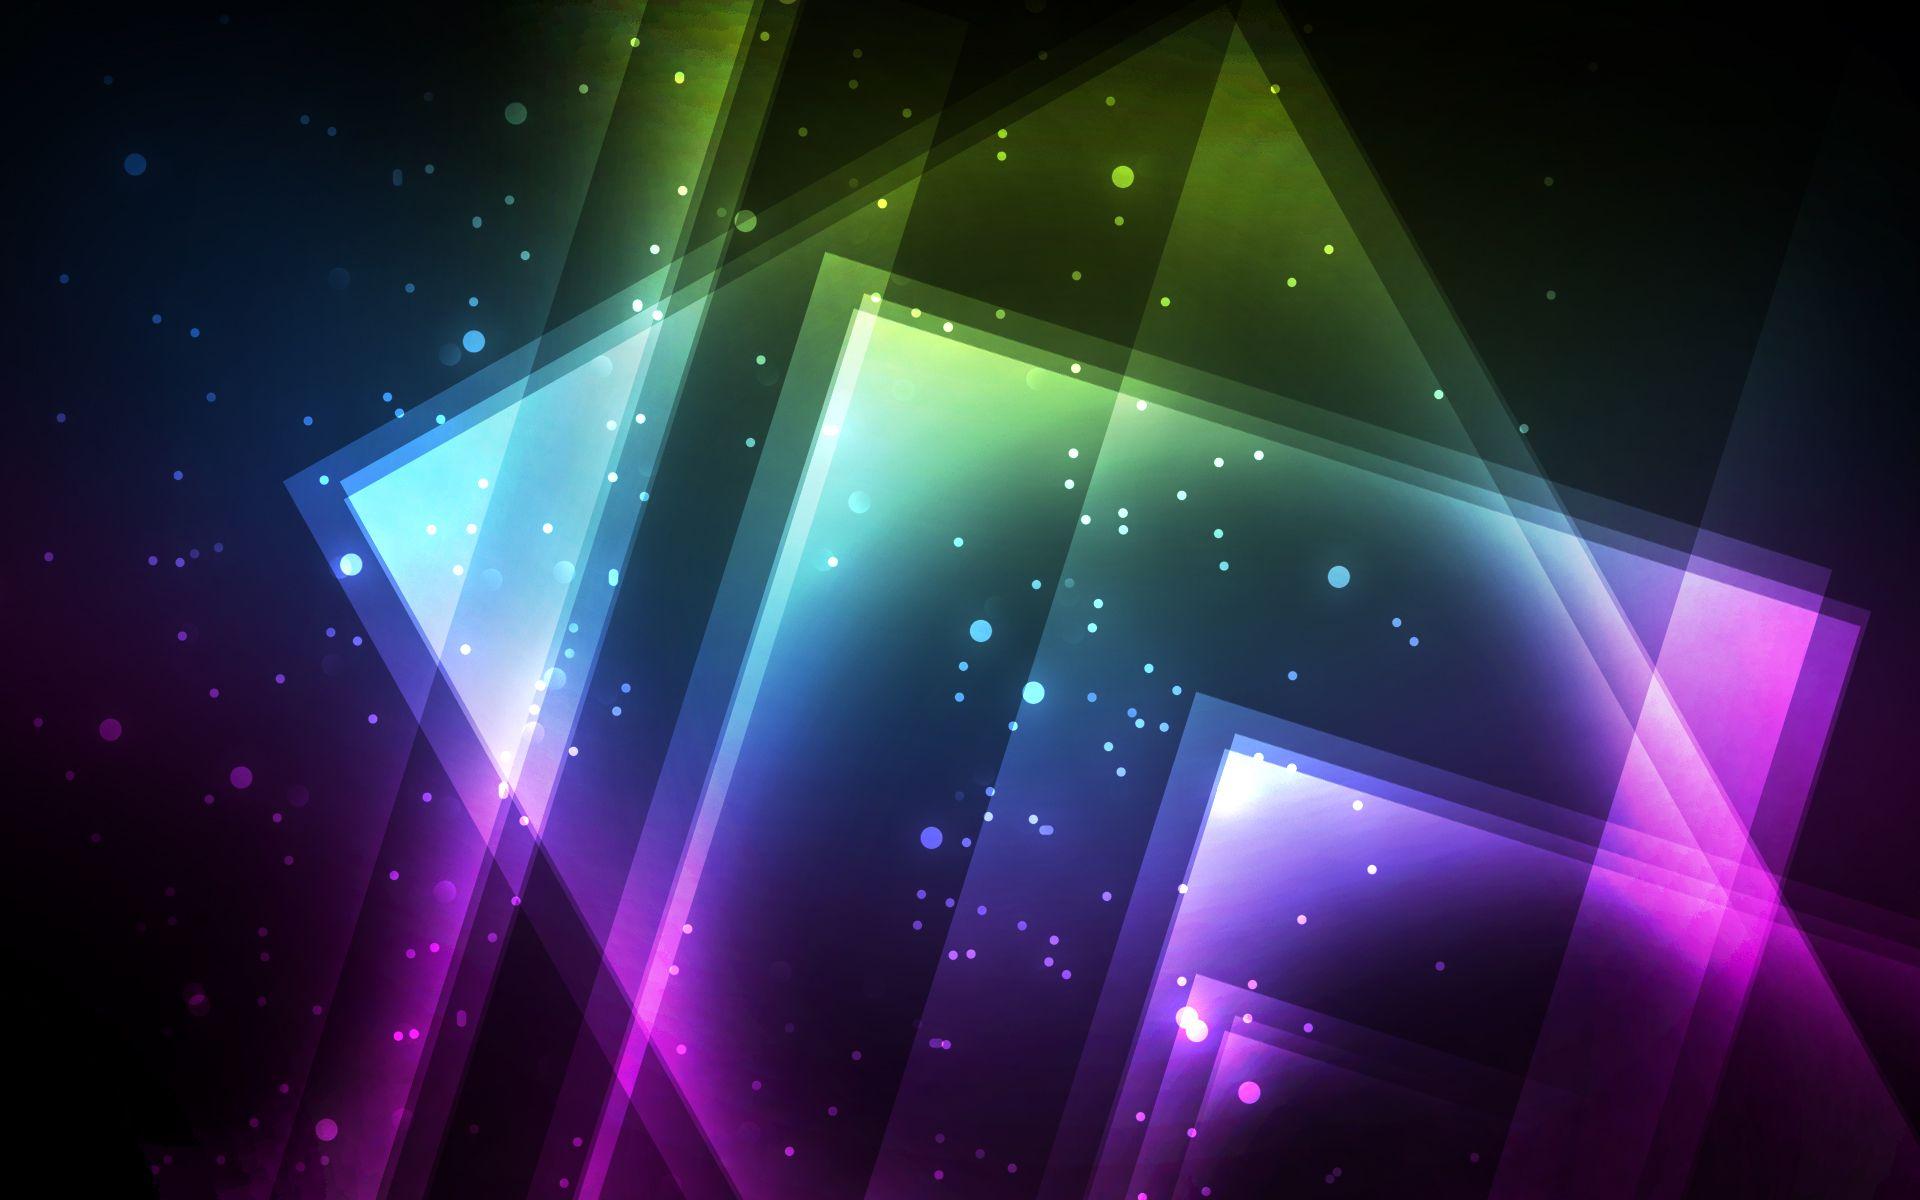 Colourful, Digital, Glow, Hd, Wallpaper